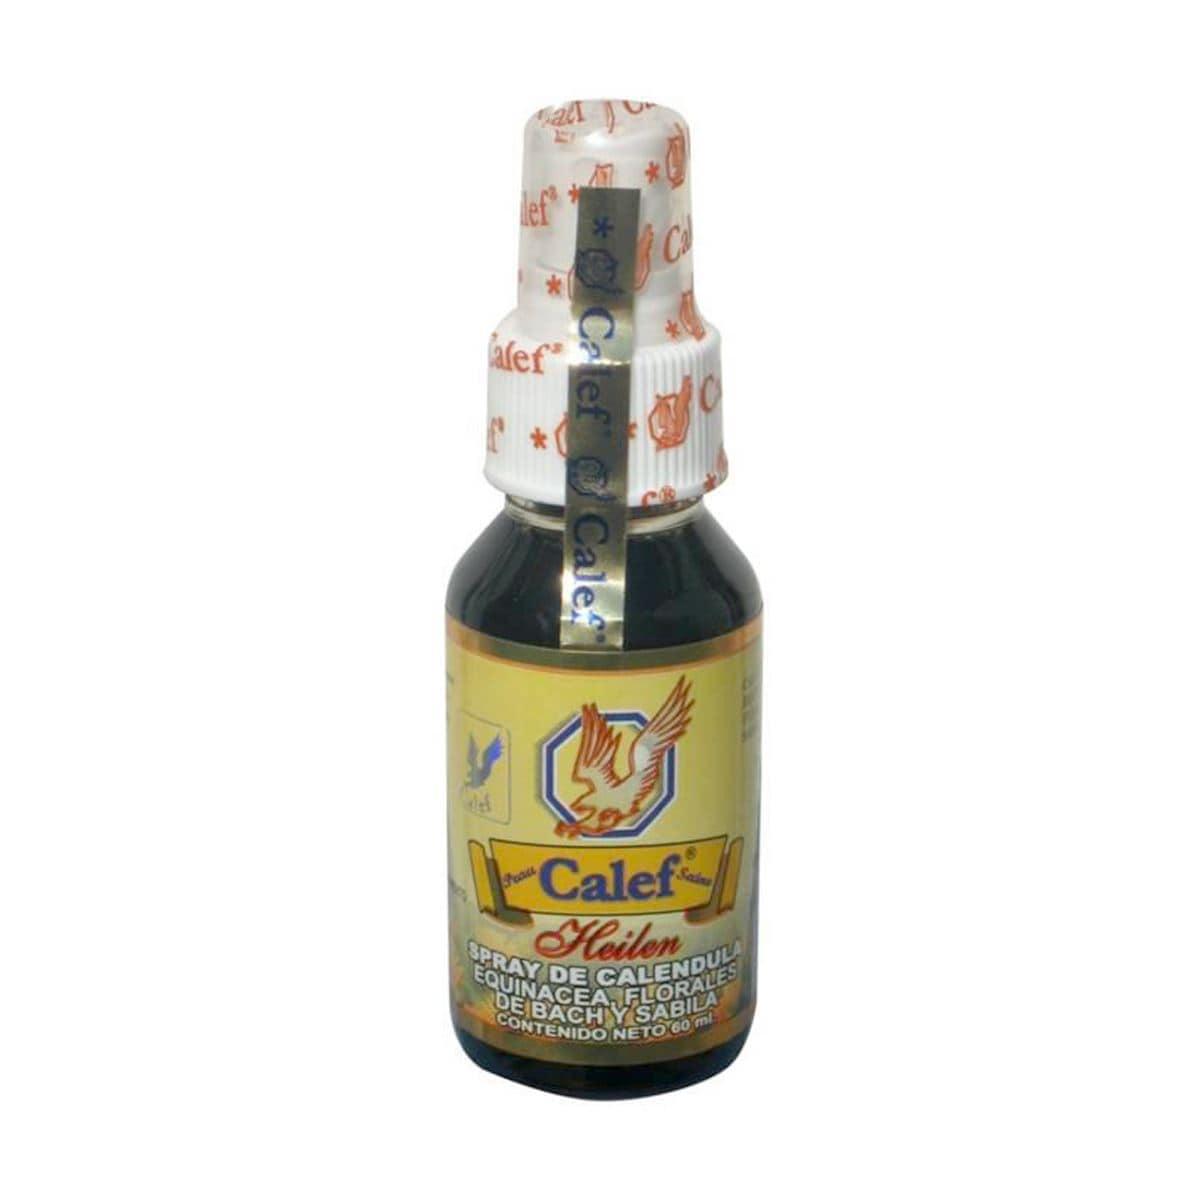 Spray de Caléndula Calef